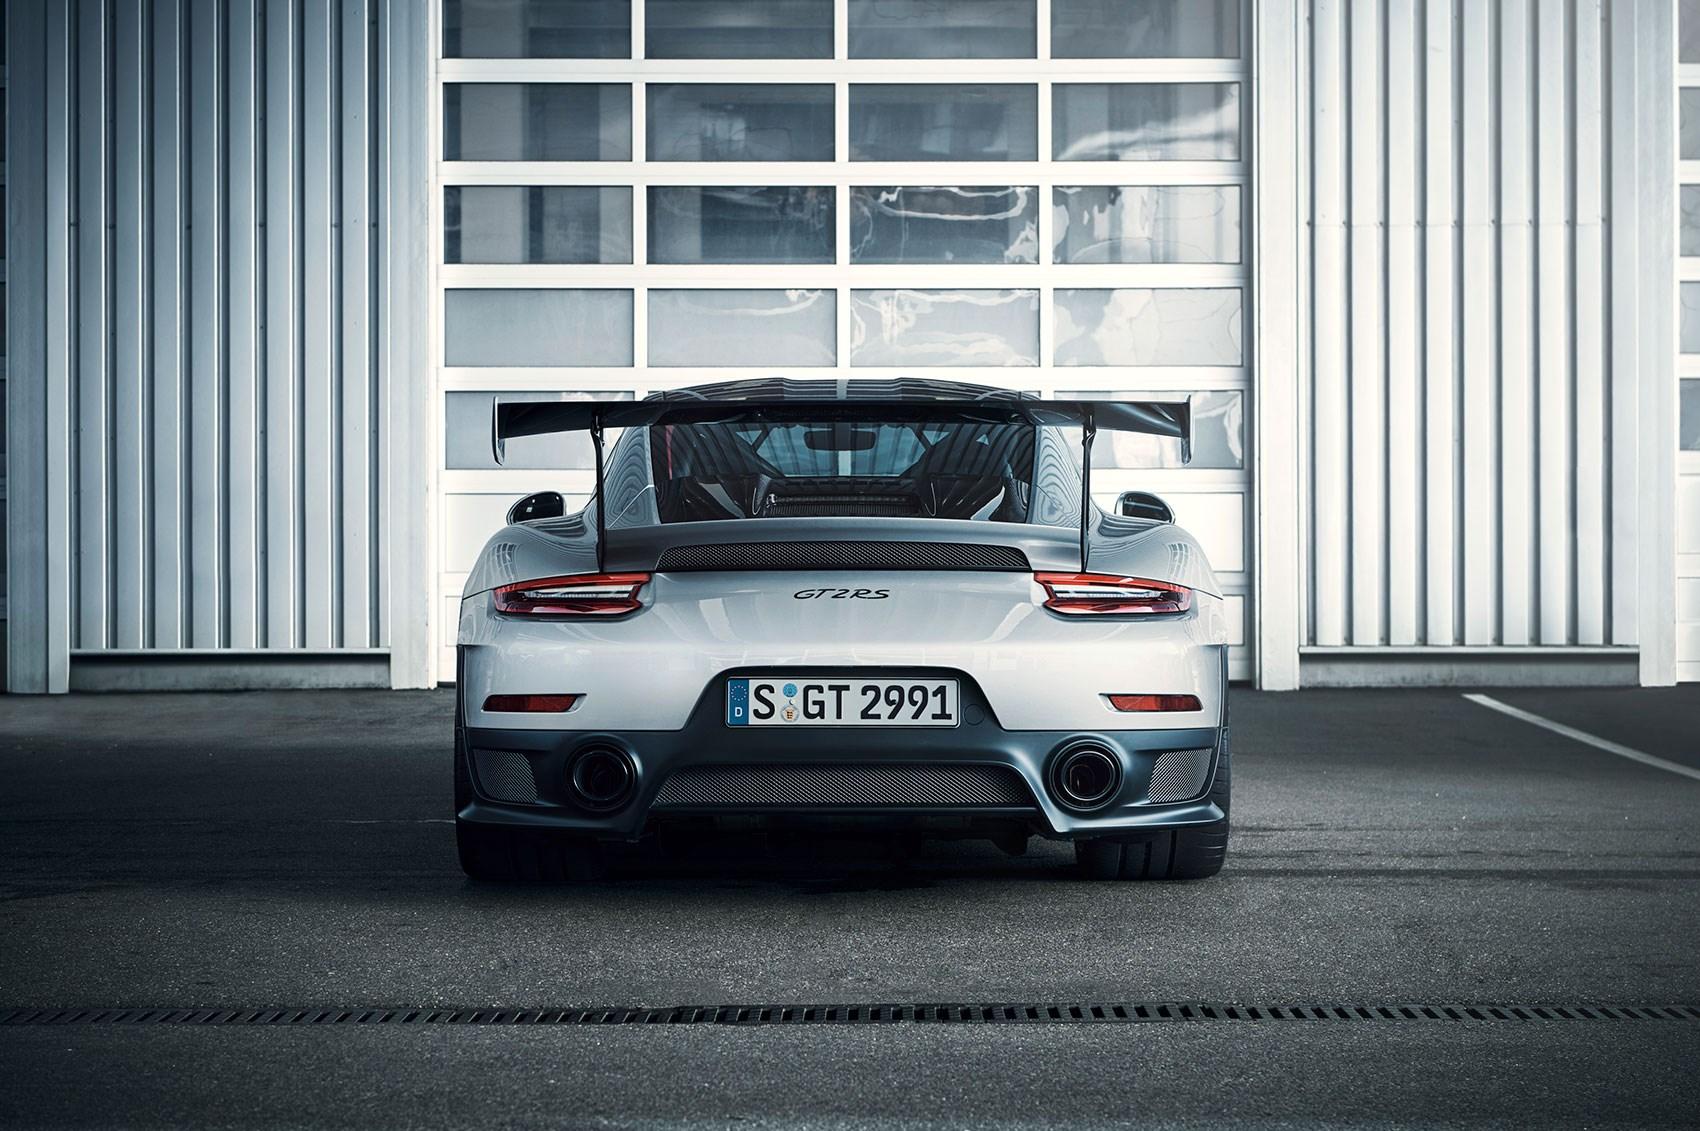 z_porsche_911_gt2_rs_rear Wonderful Porsche 911 Gt2 Rs Review Cars Trend